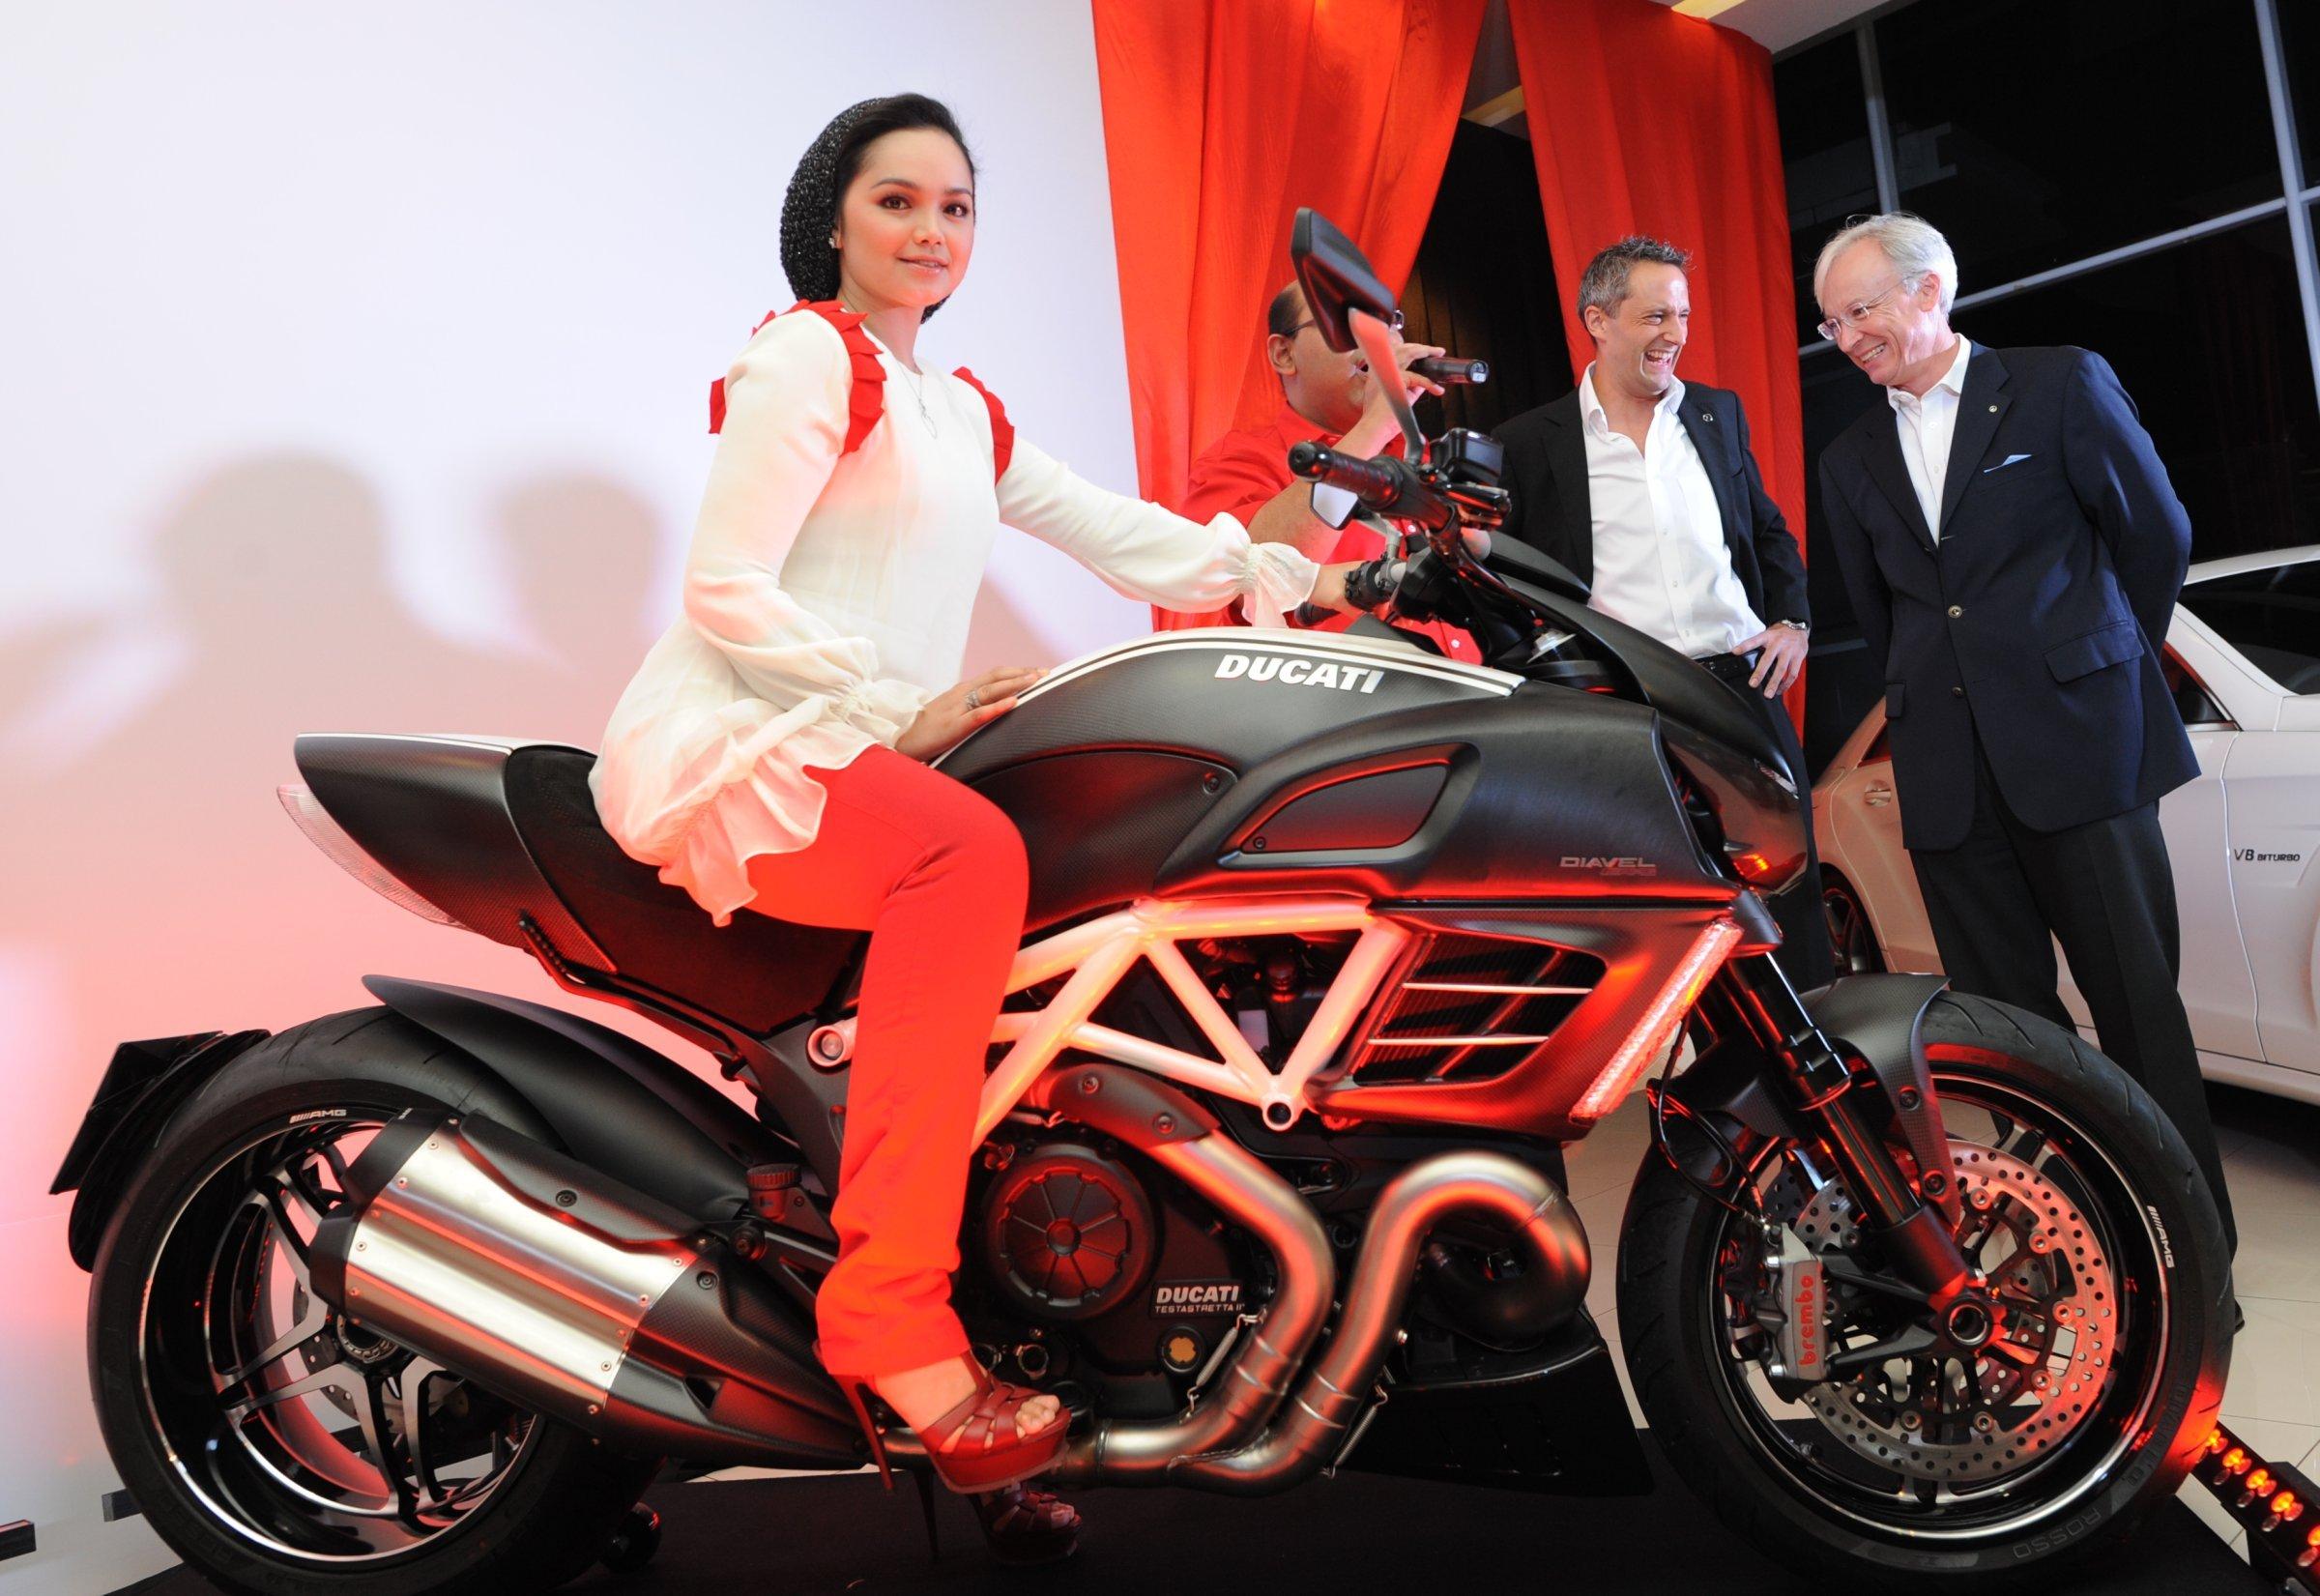 Ducati Totaled - Brick7 Motorcycle